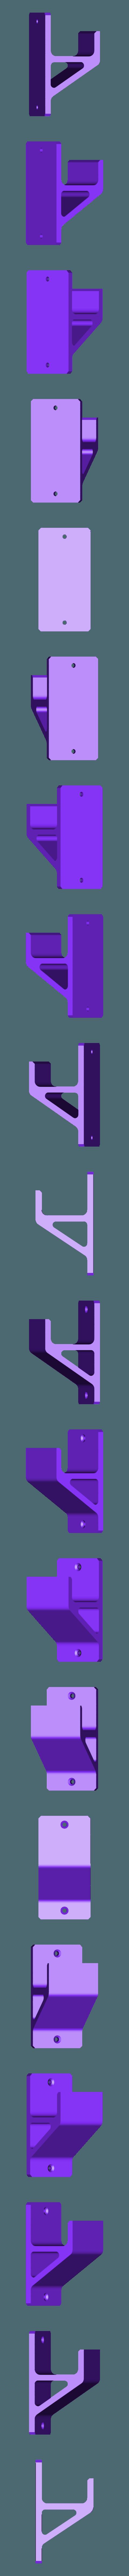 Schraubzwingehalter-mittel.STL Descargar archivo STL gratis Schraubzwingenhalter / Soporte de abrazadera de tornillo • Diseño para imprimir en 3D, Chileo